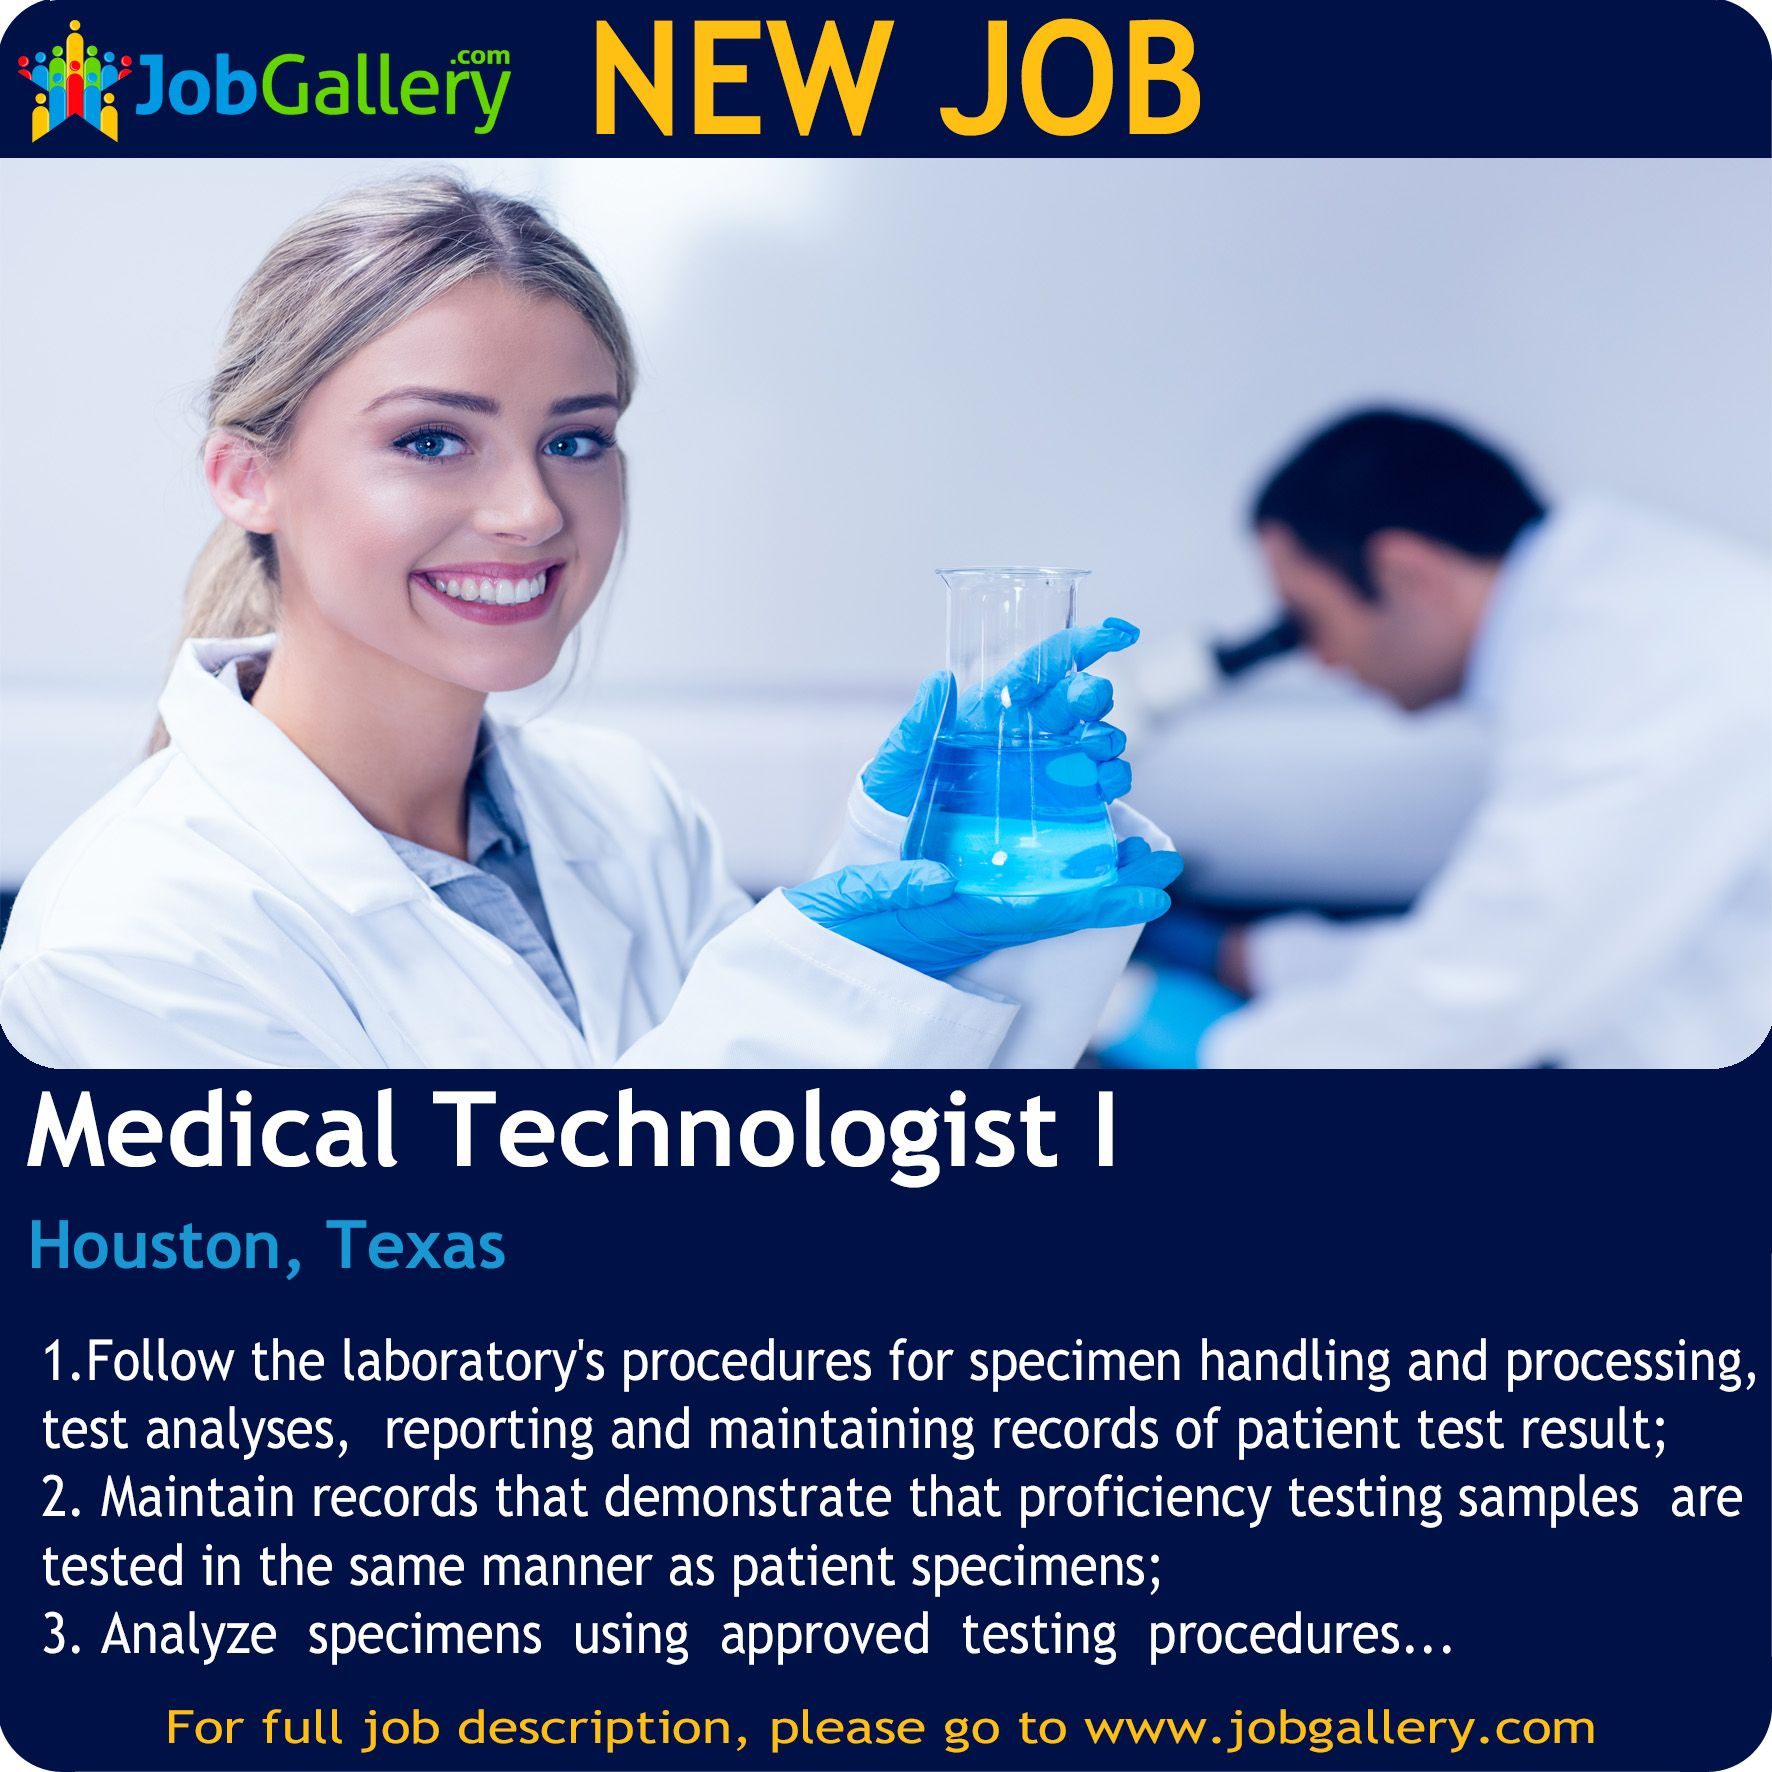 SEEKING A MEDICAL TECHNOLOGIST I IN HOUSTON, TEXAS Job